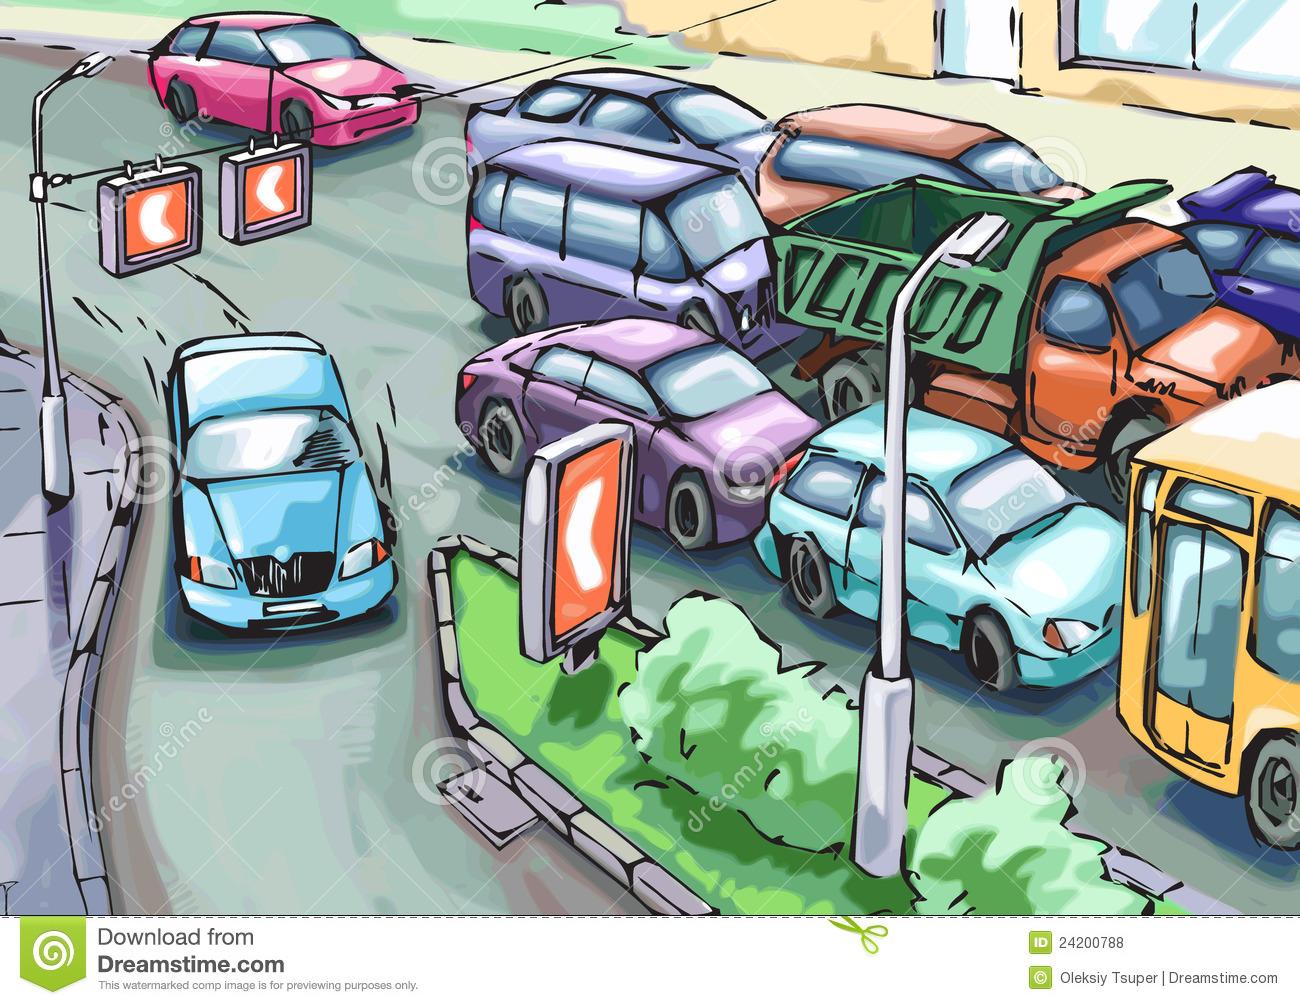 clip art traffic jam clipart clipart suggest traffic clipart traffic clip art images free